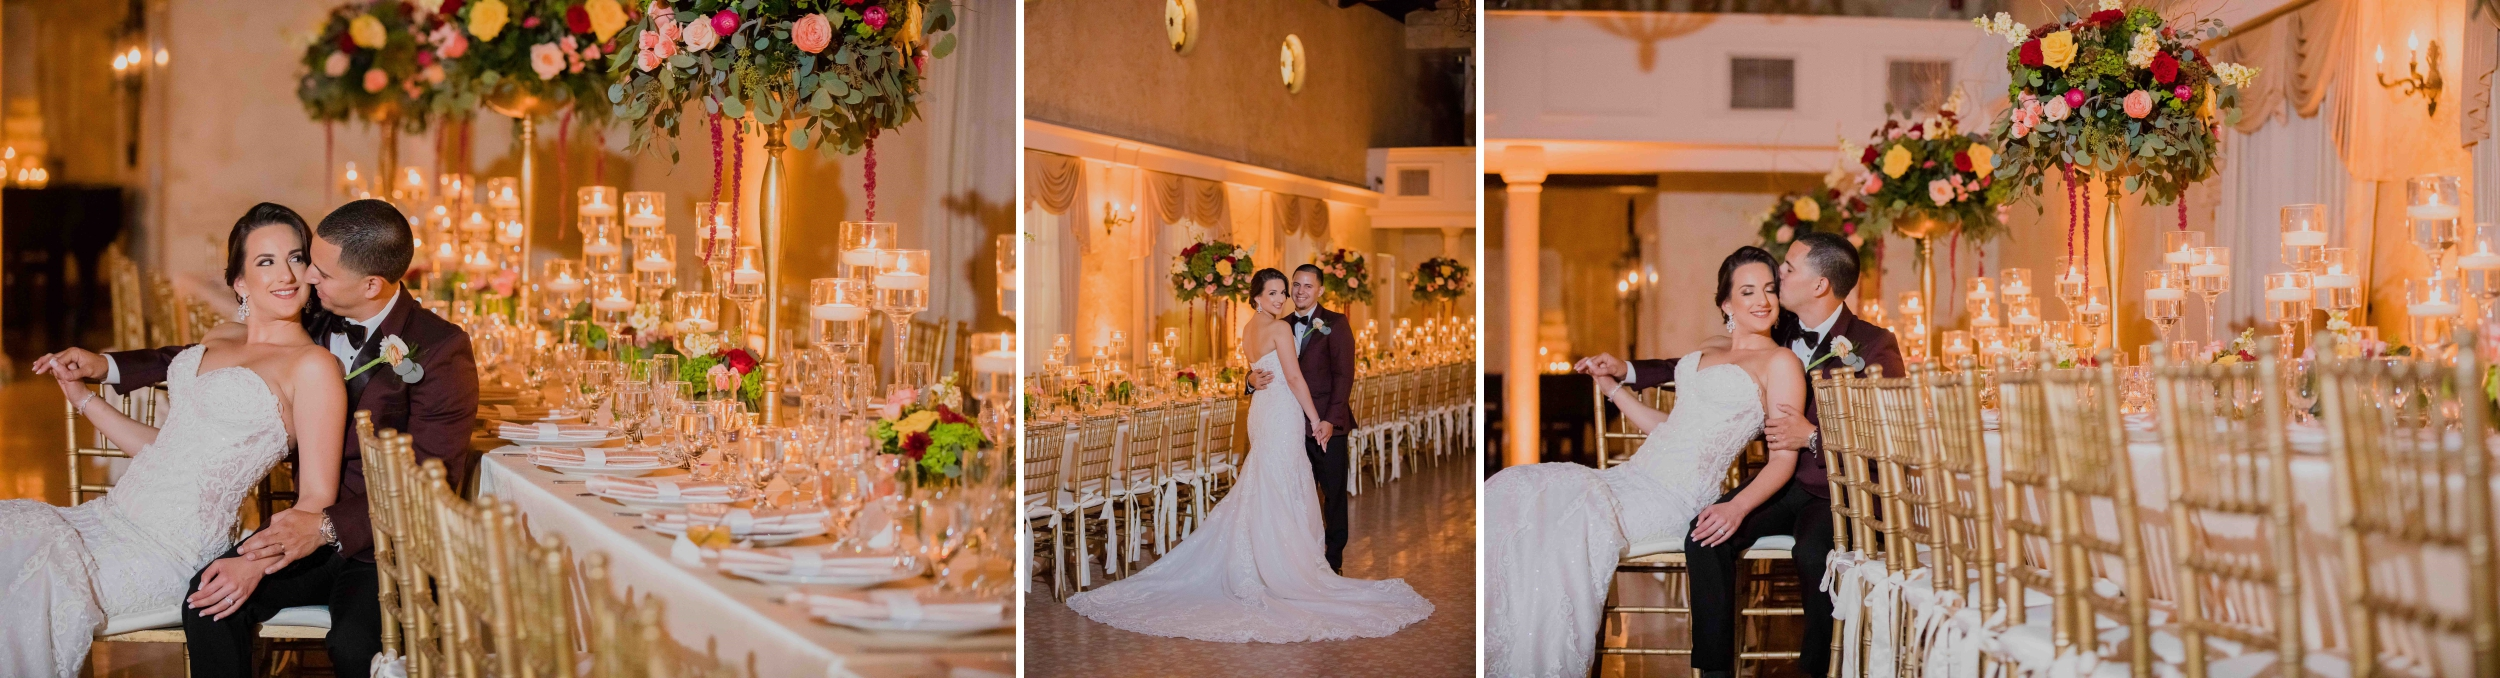 Wedding - Coco Plum - Coral Gables Congregational - Santy Martinez Photography 29.jpg